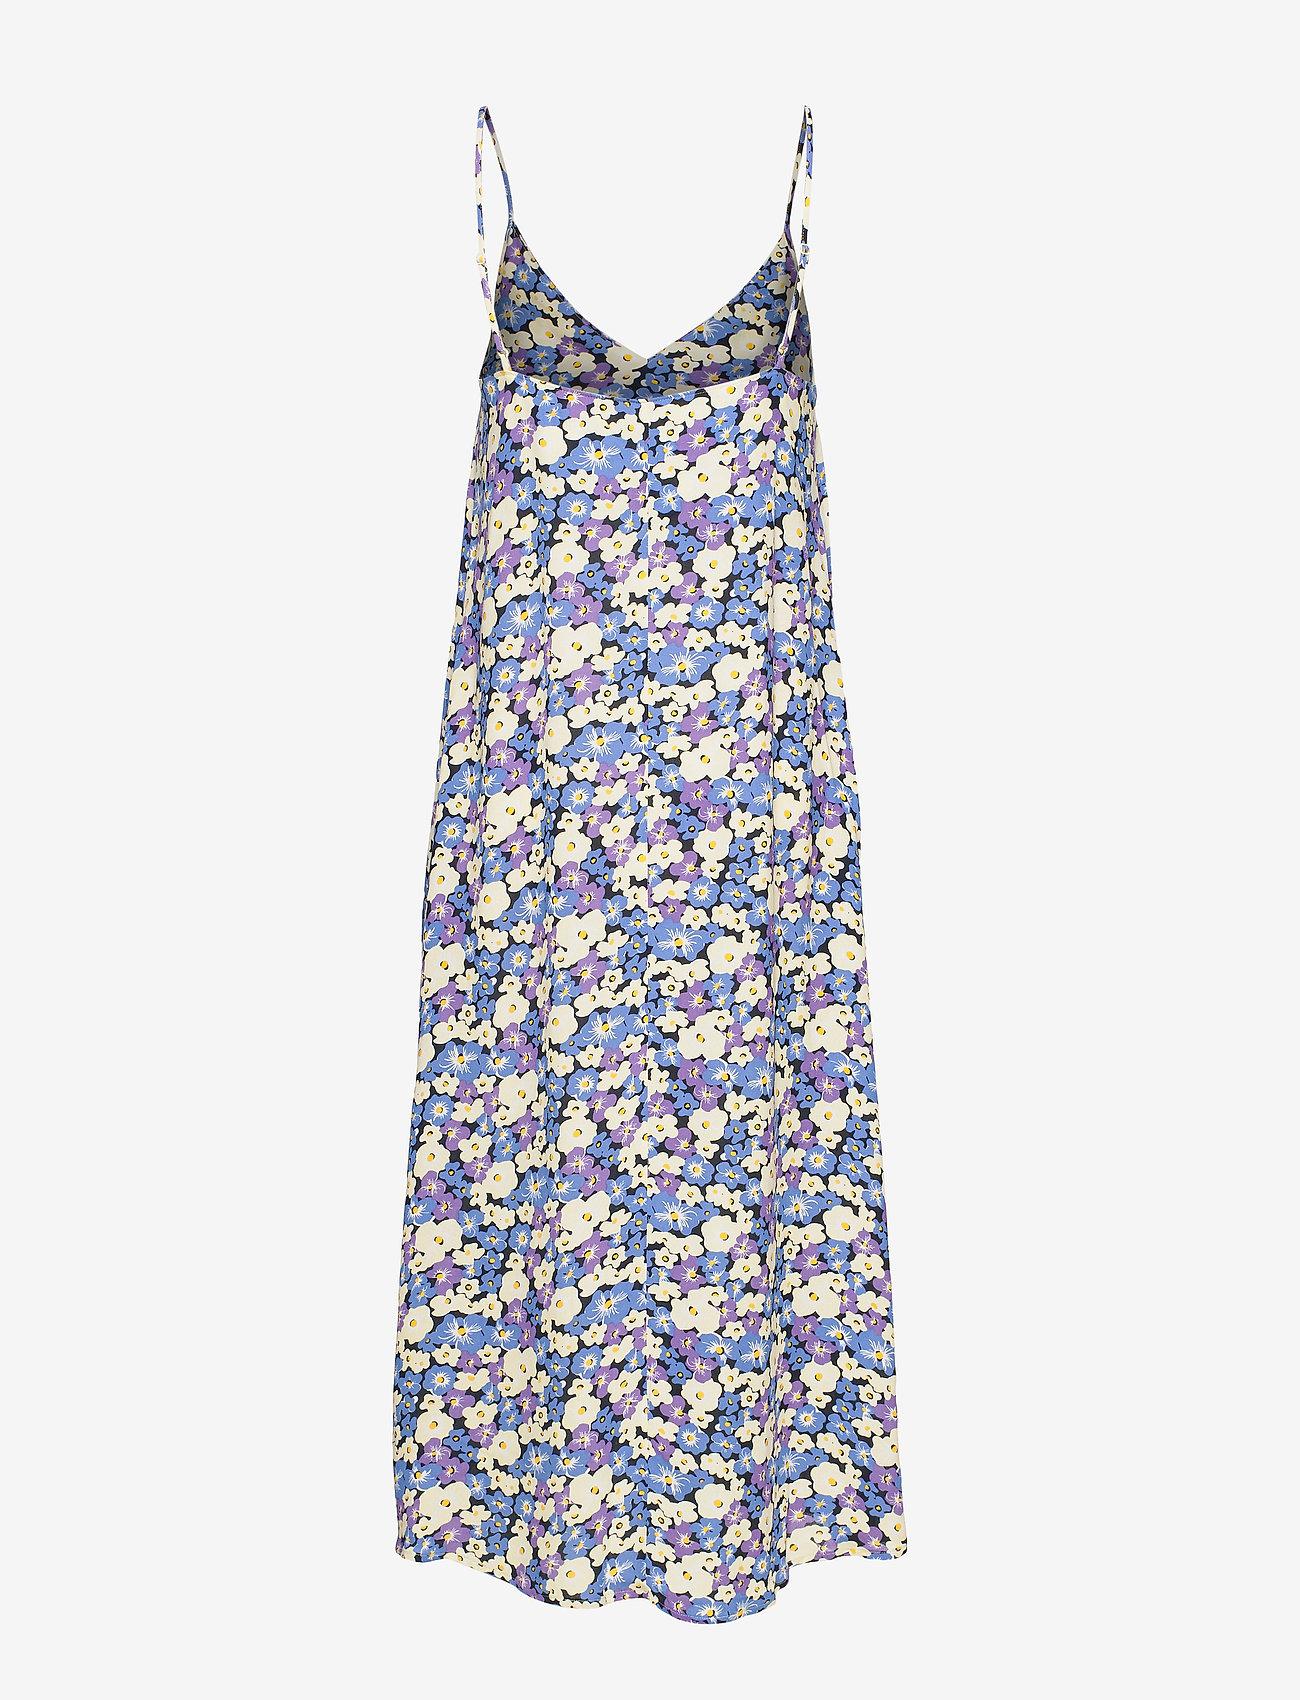 Dalila Dress (Chalk Violet) (1895 kr) - Lovechild 1979